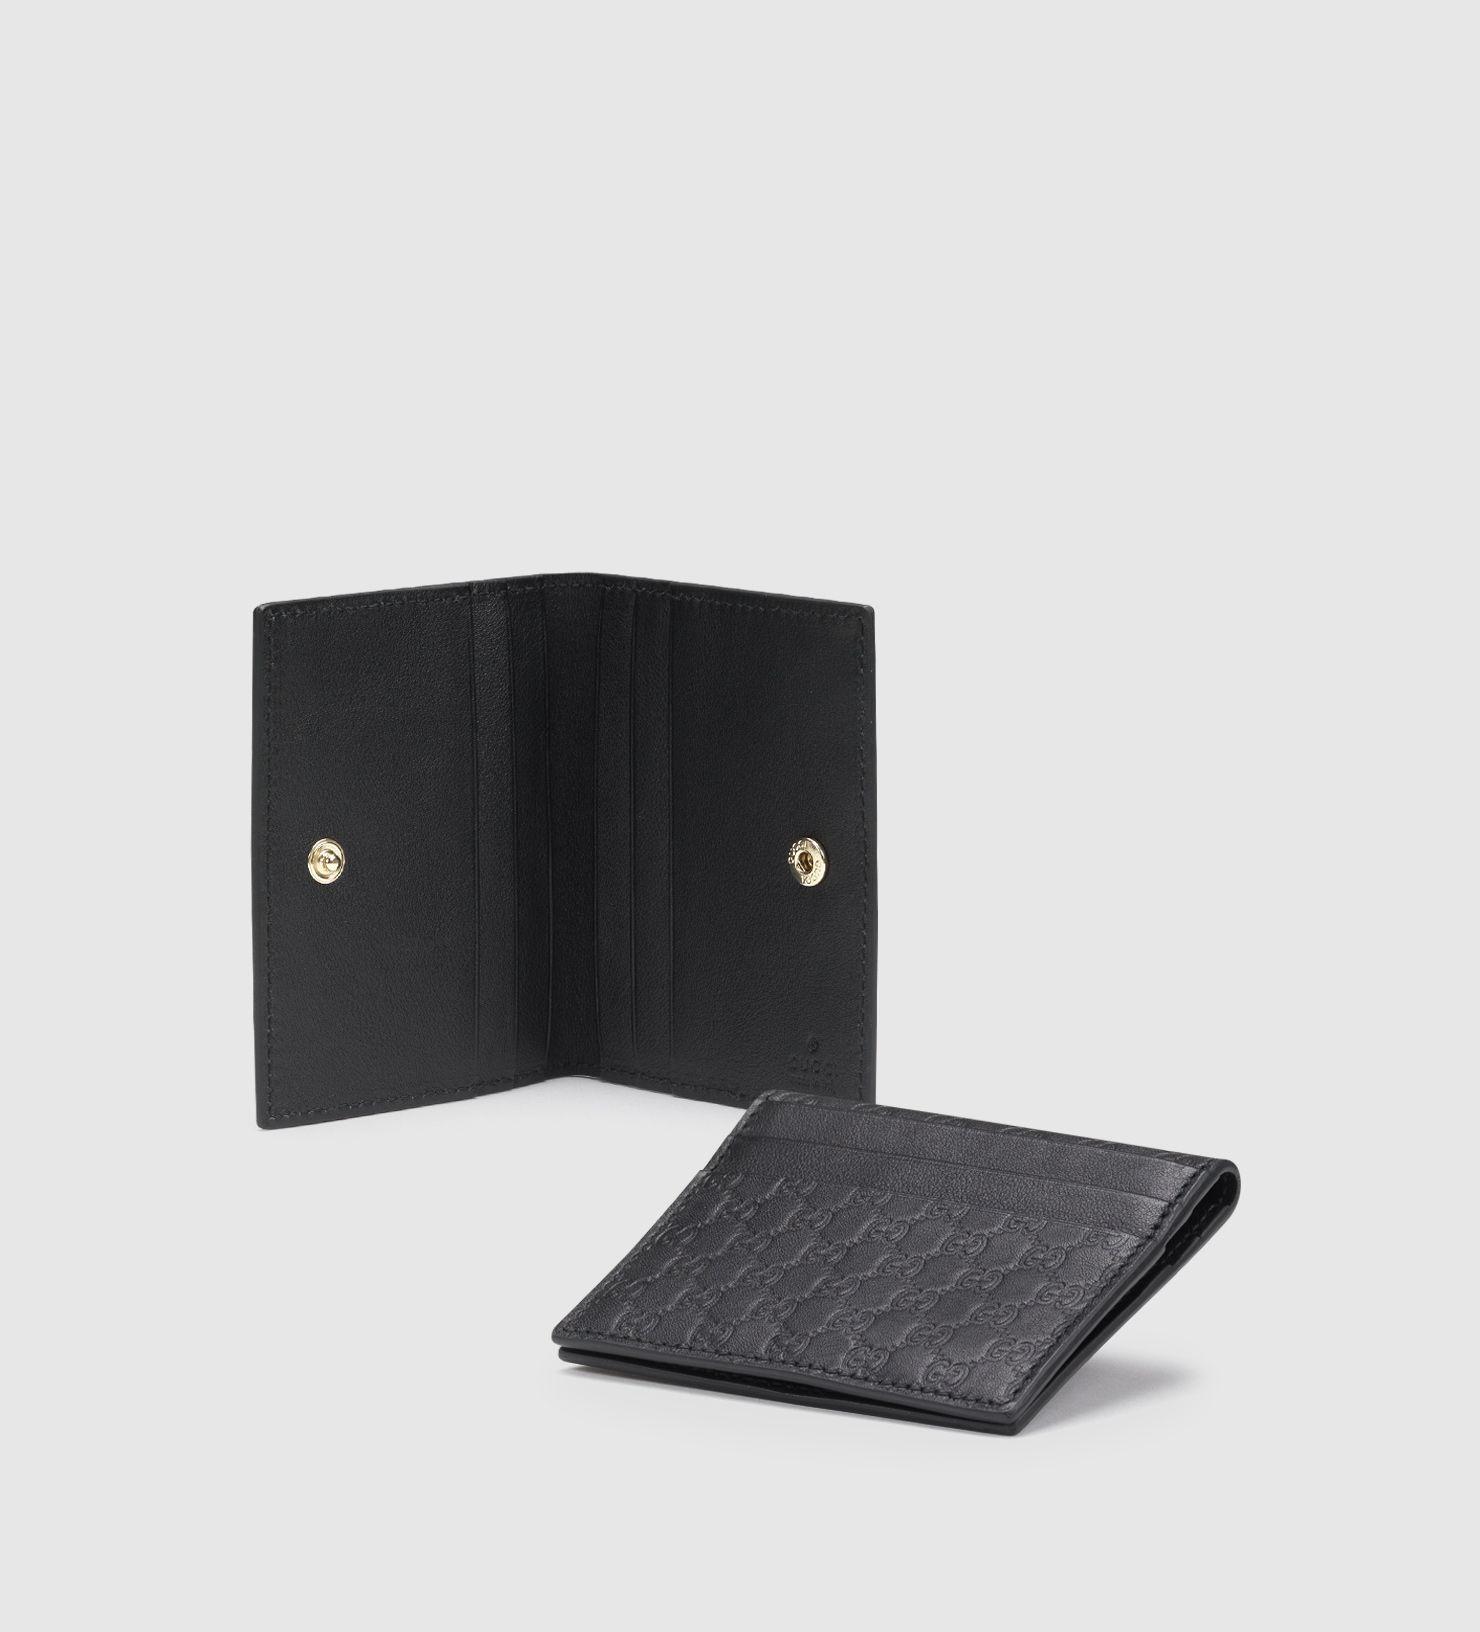 Gucci microguccissima leather card case | accessories | Pinterest ...